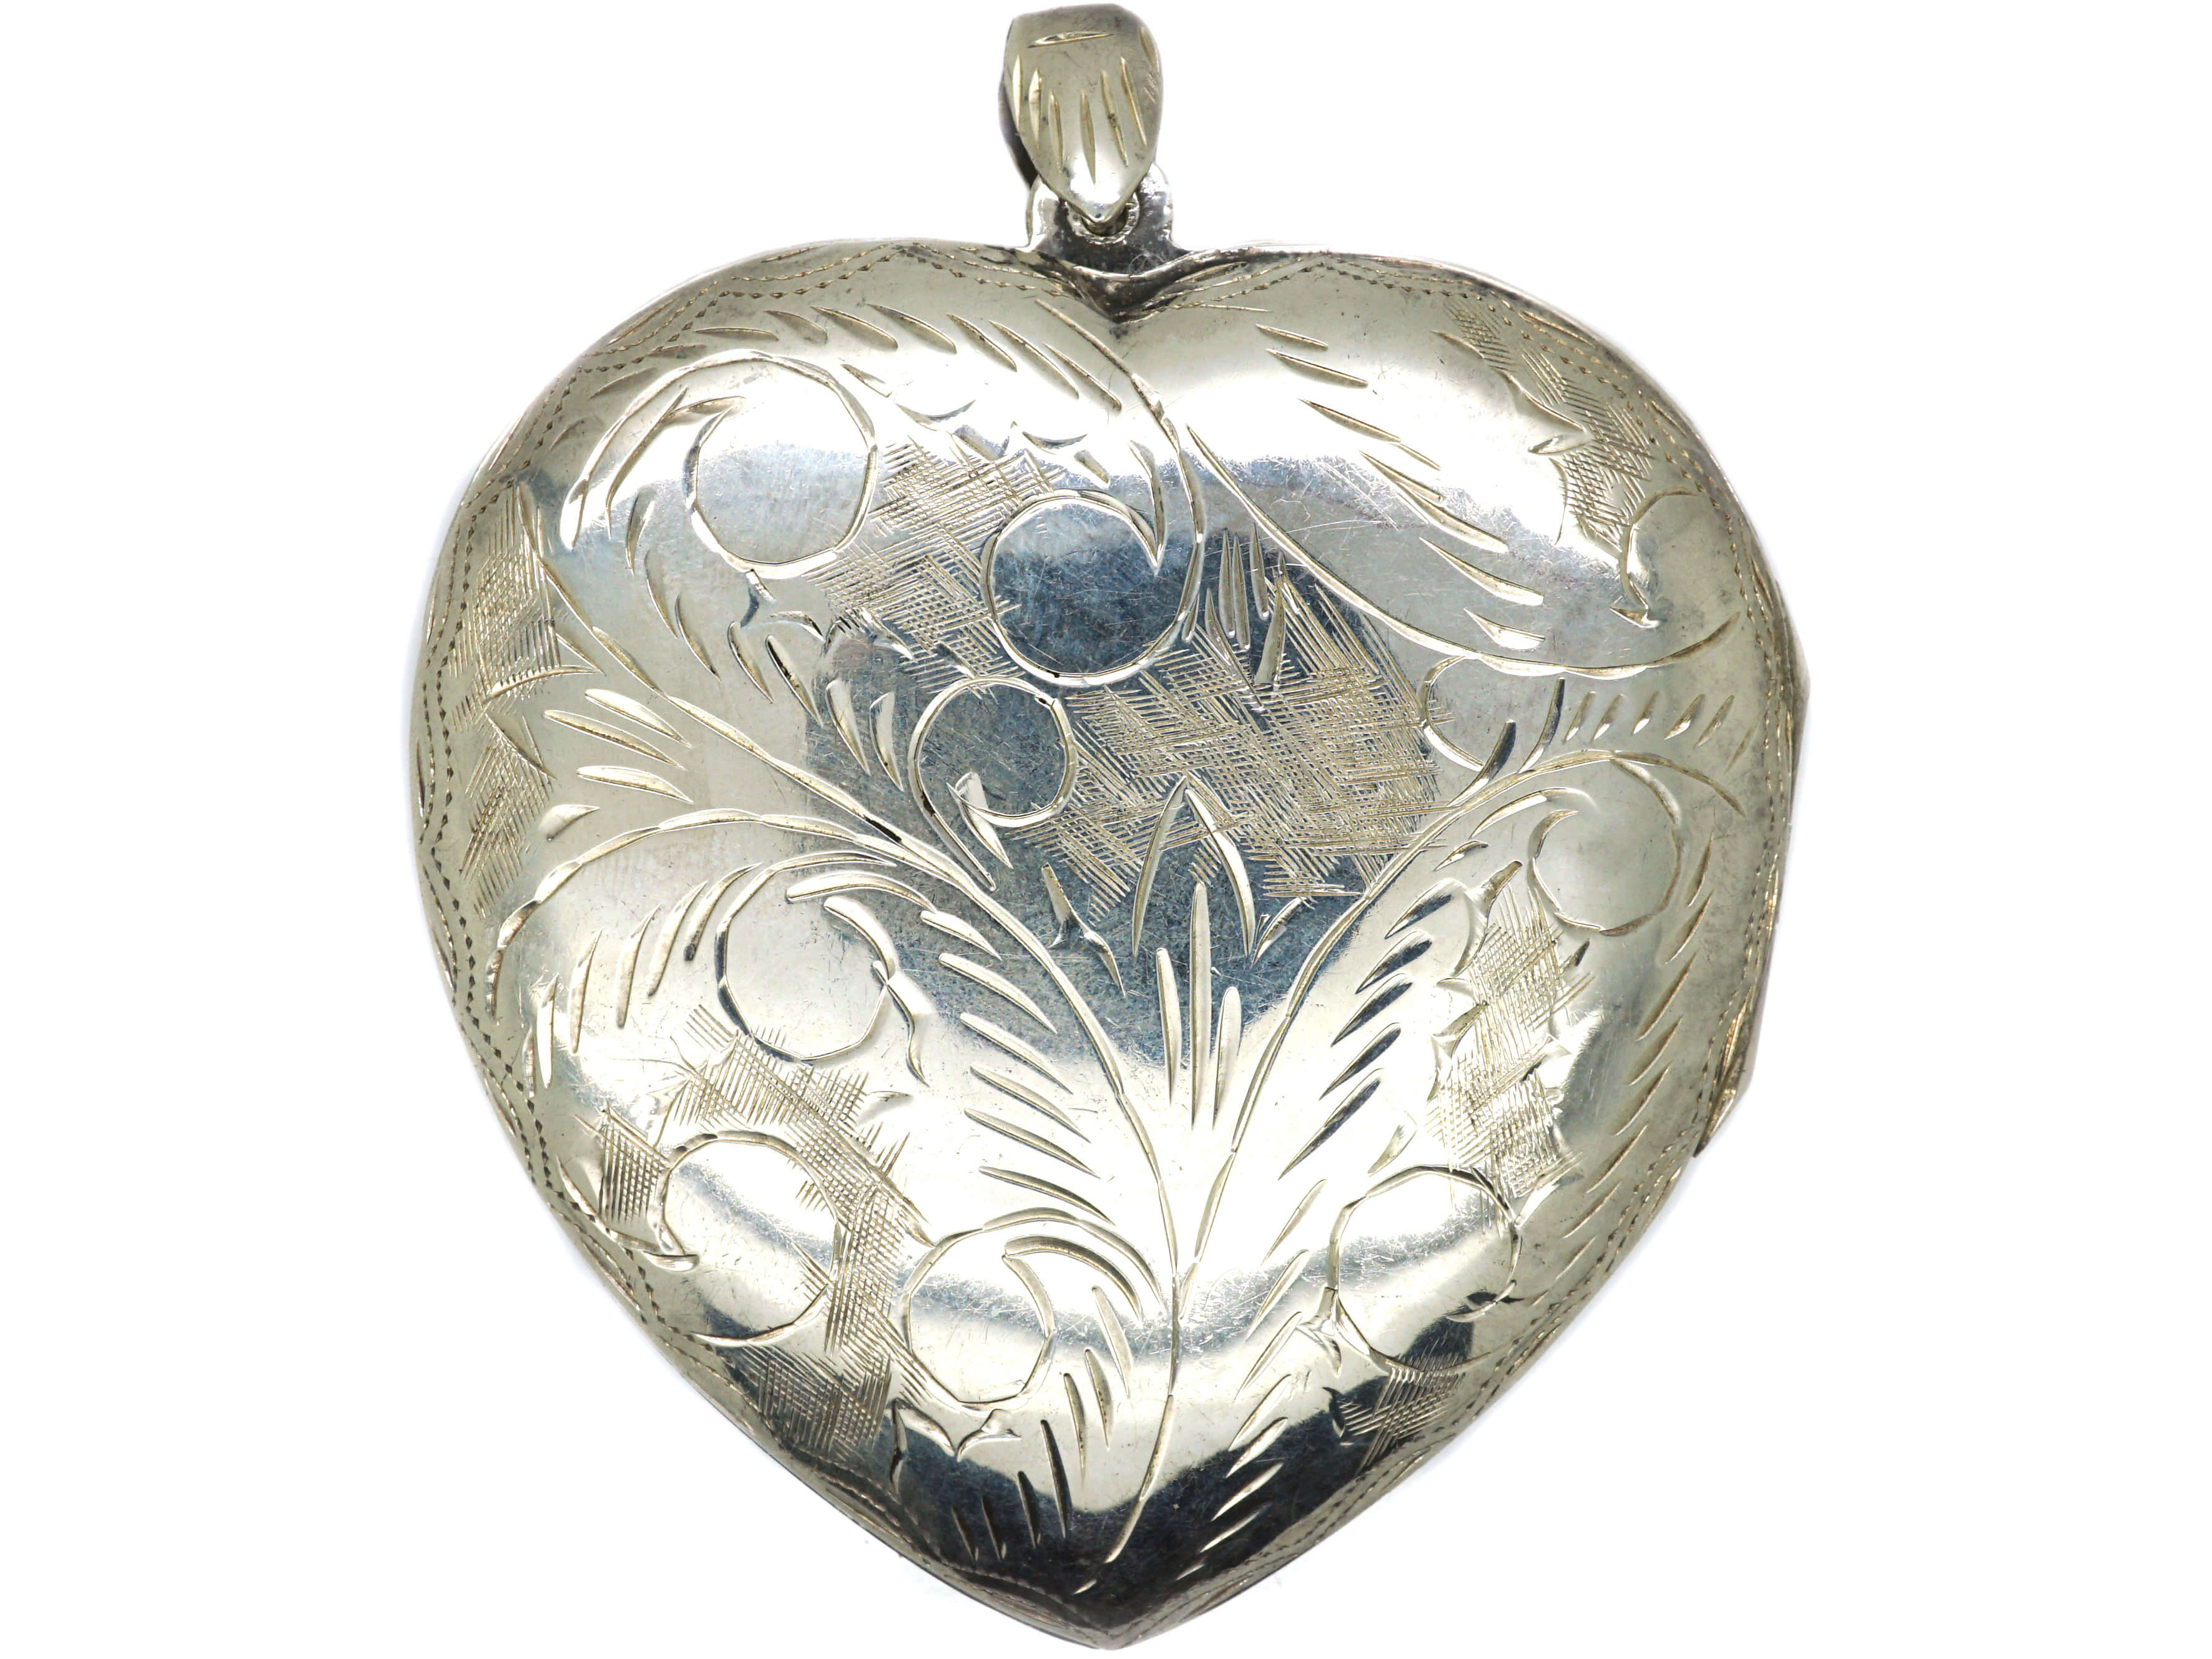 Large Silver Heart Shaped Locket